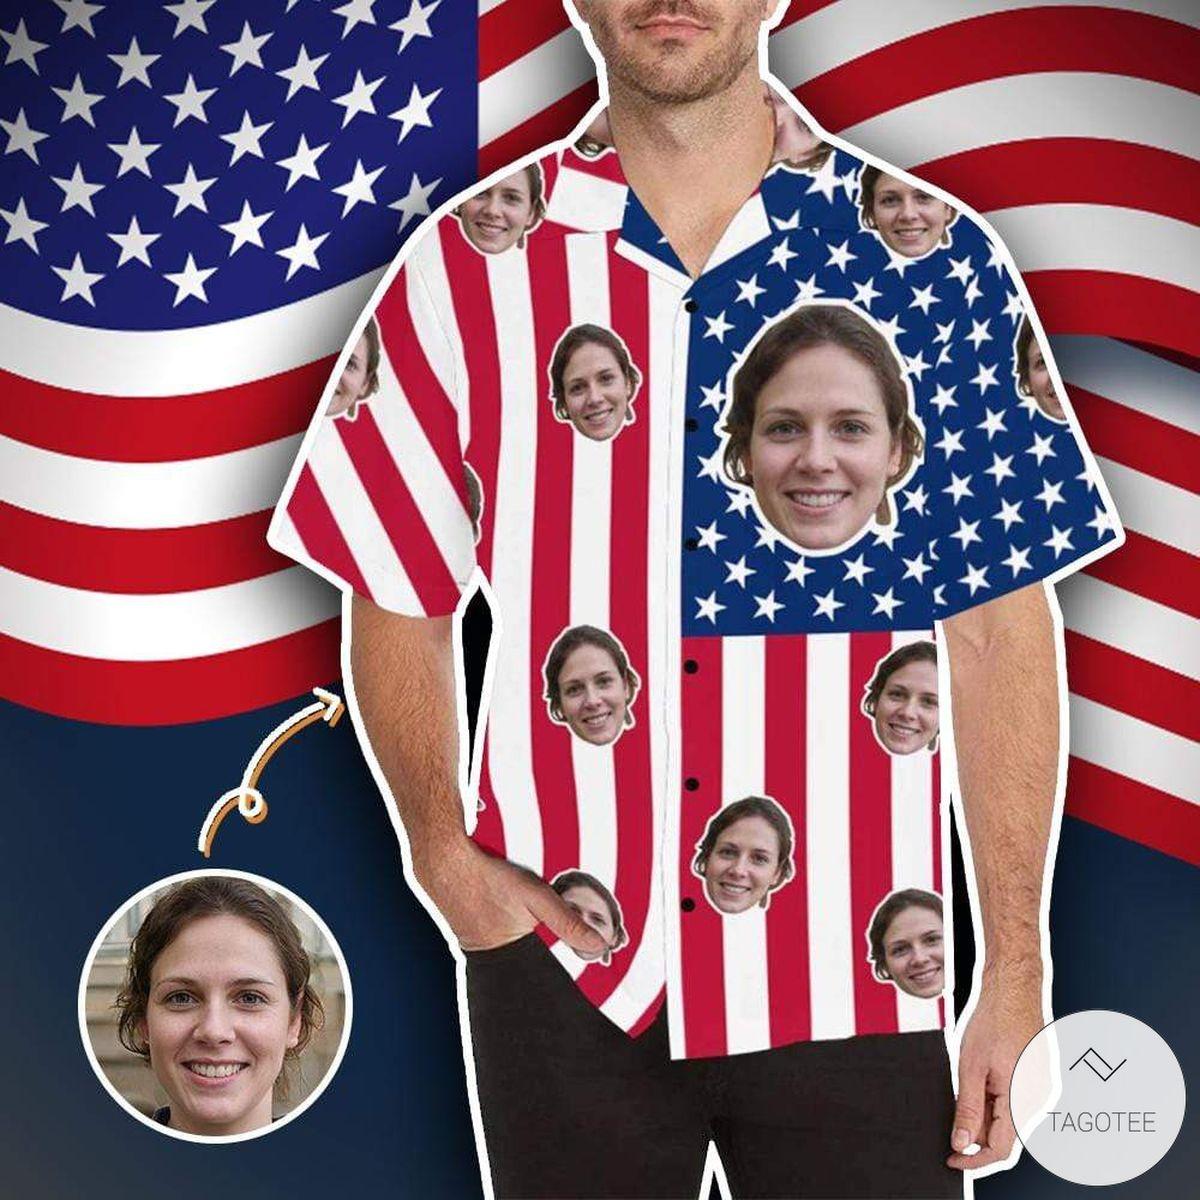 Personalized Face Photo American Flag Hawaiian Shirt